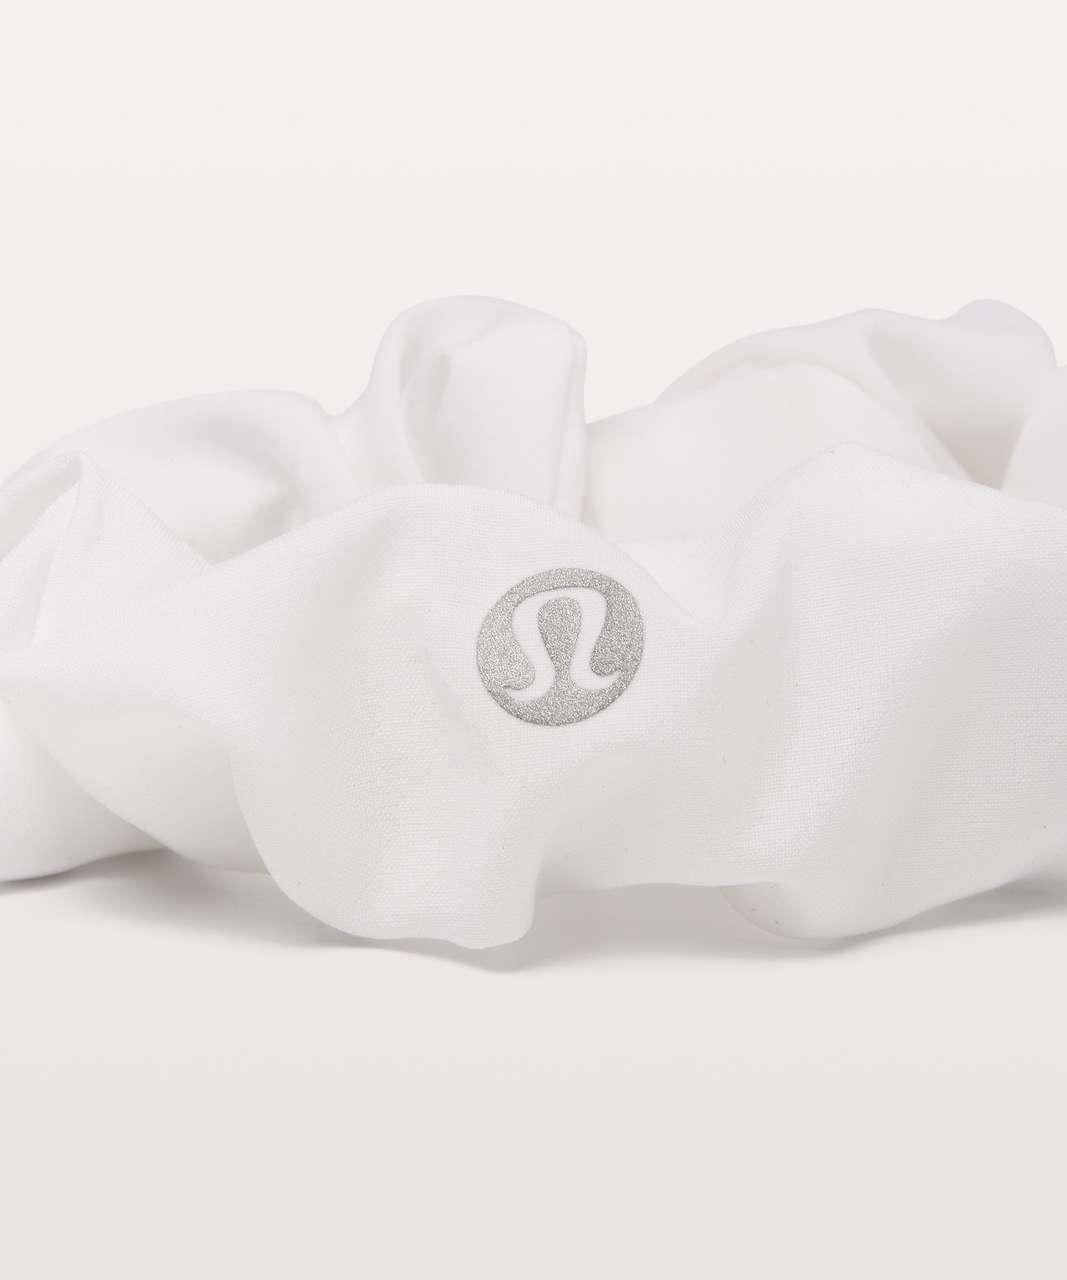 Lululemon Uplifting Scrunchie - White (Second Release)